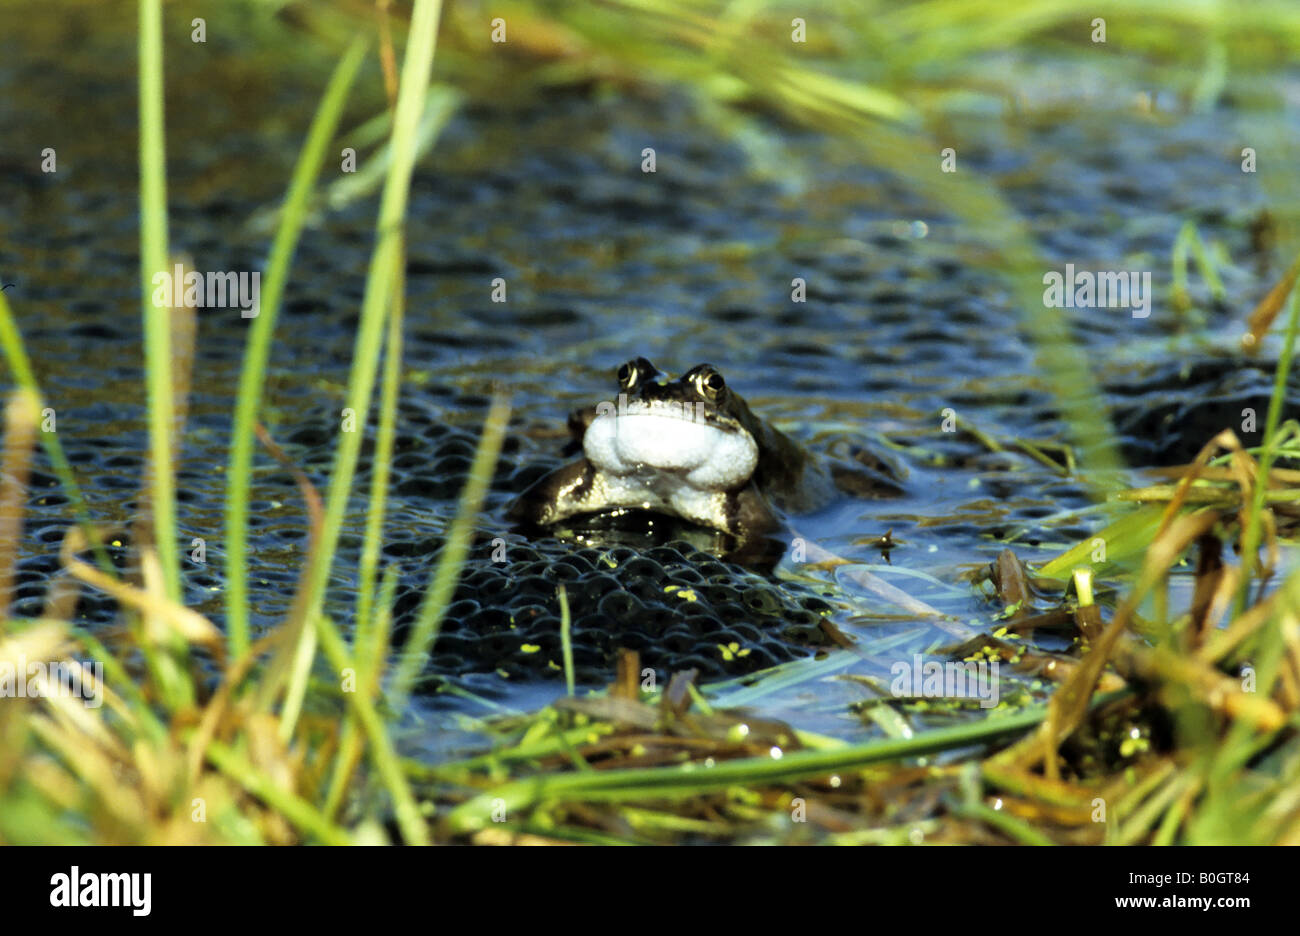 Croaking Frog. - Stock Image